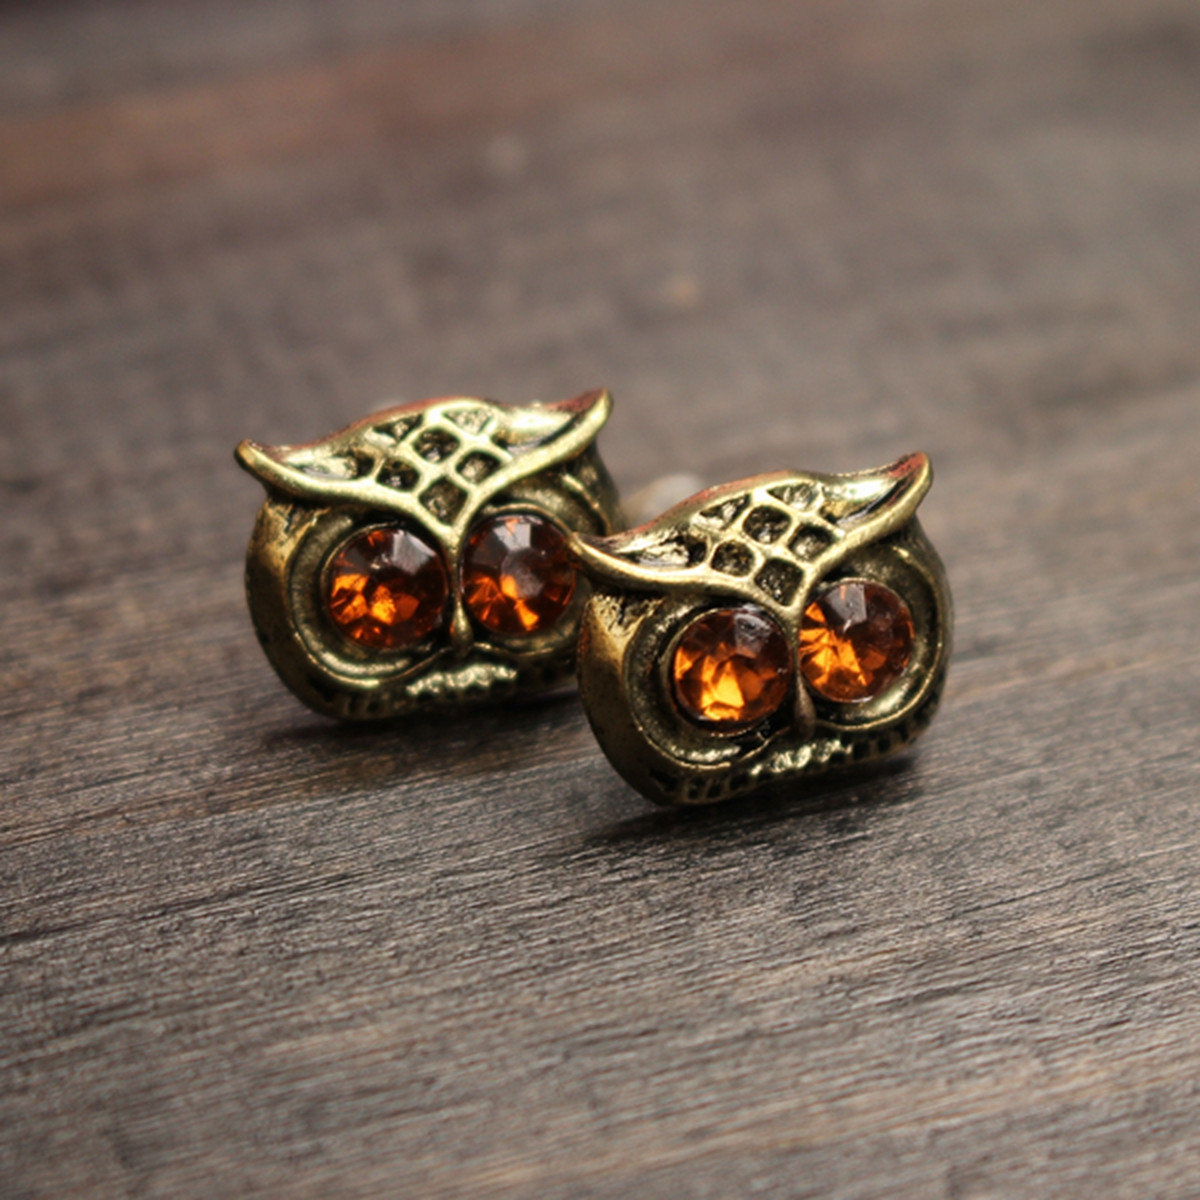 Vintage Unisex Earrings Alloy Owl Rhinestone Eye Earrings